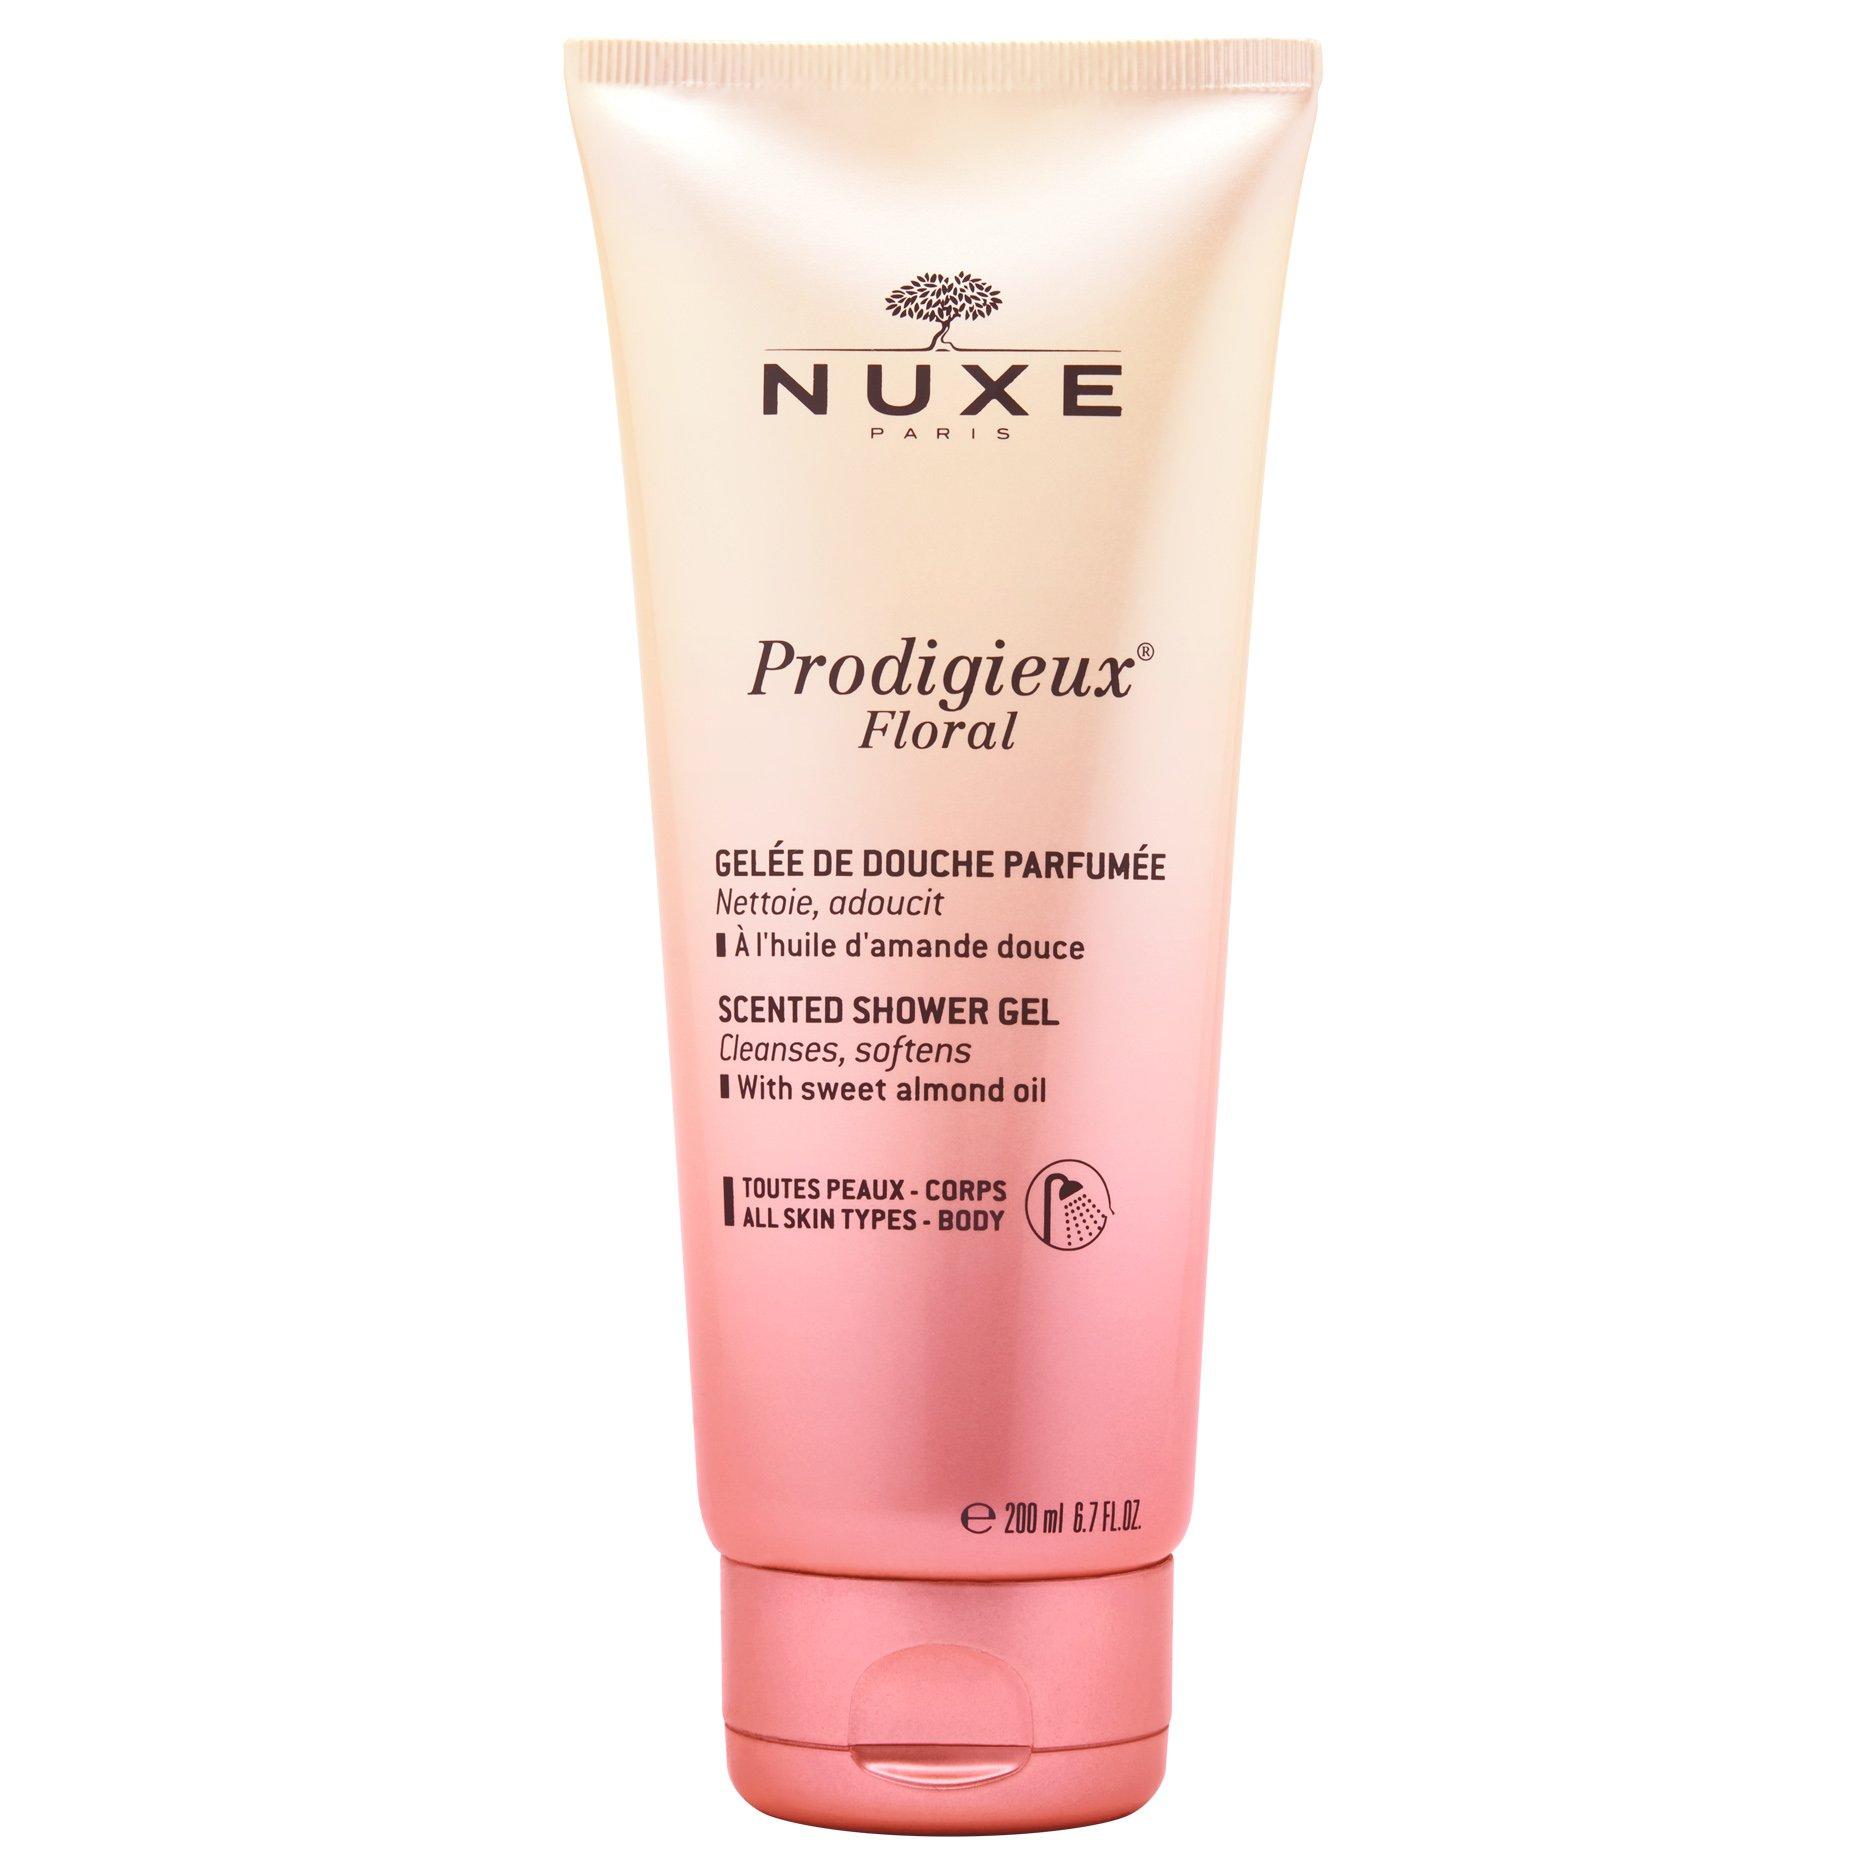 Nuxe Prodigieux Floral Scented Shower Gel Αφρόλουτρο Σώματος με Έλαιο Γλυκού Αμυγδάλου & Λουλουδένιο Άρωμα 200ml